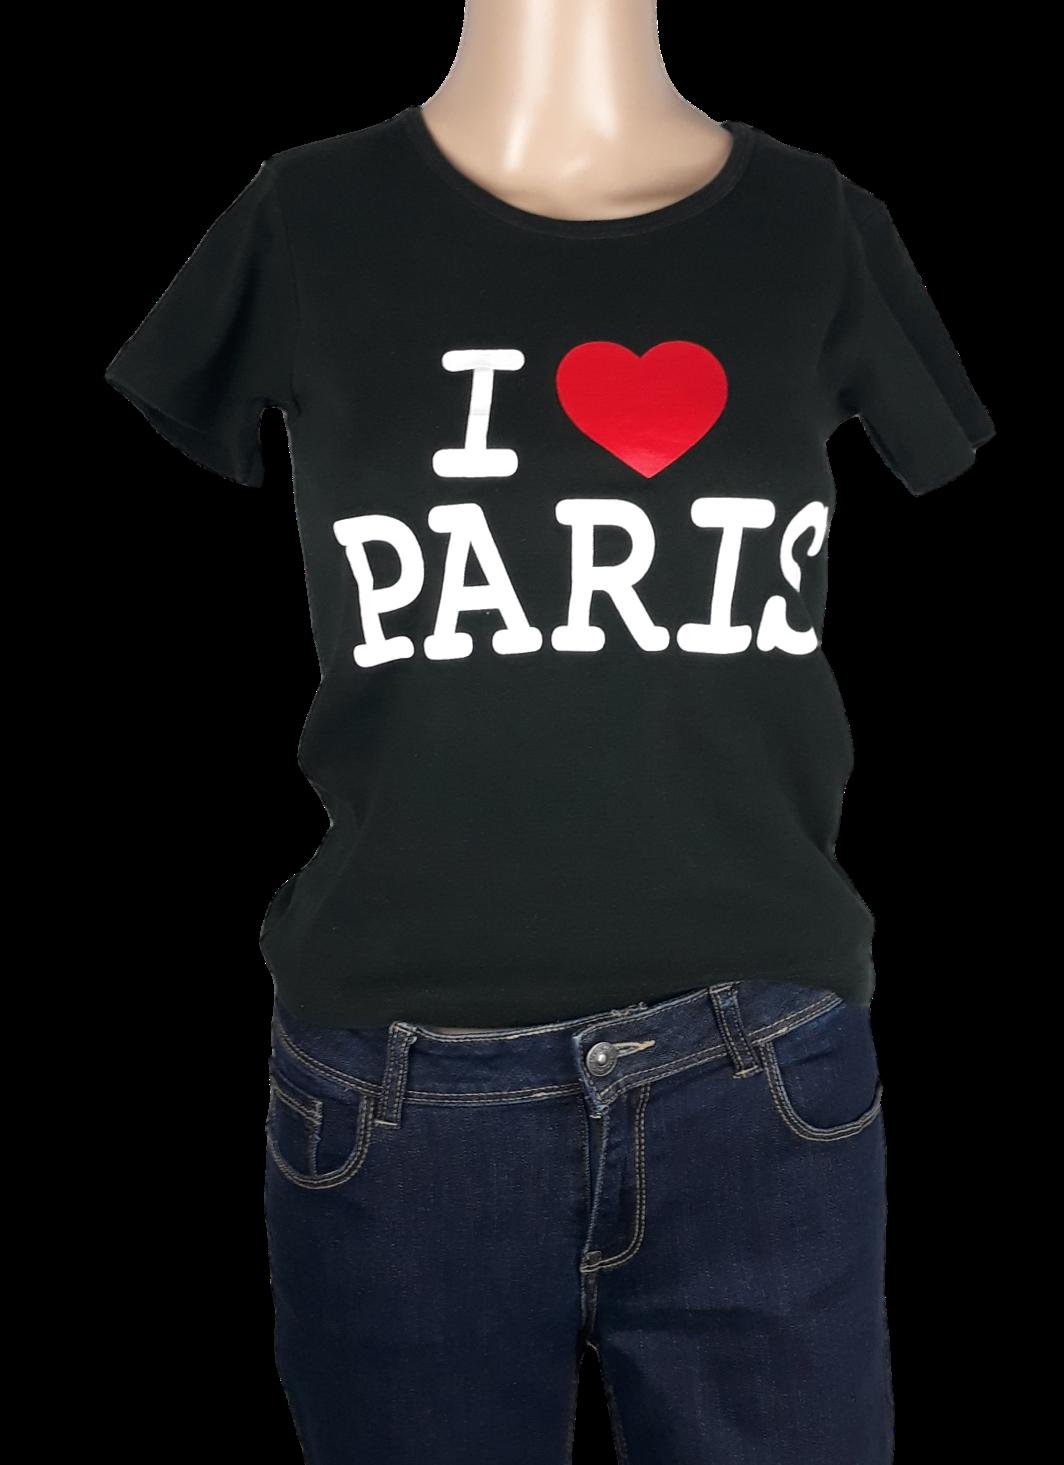 I love paris - Taille S